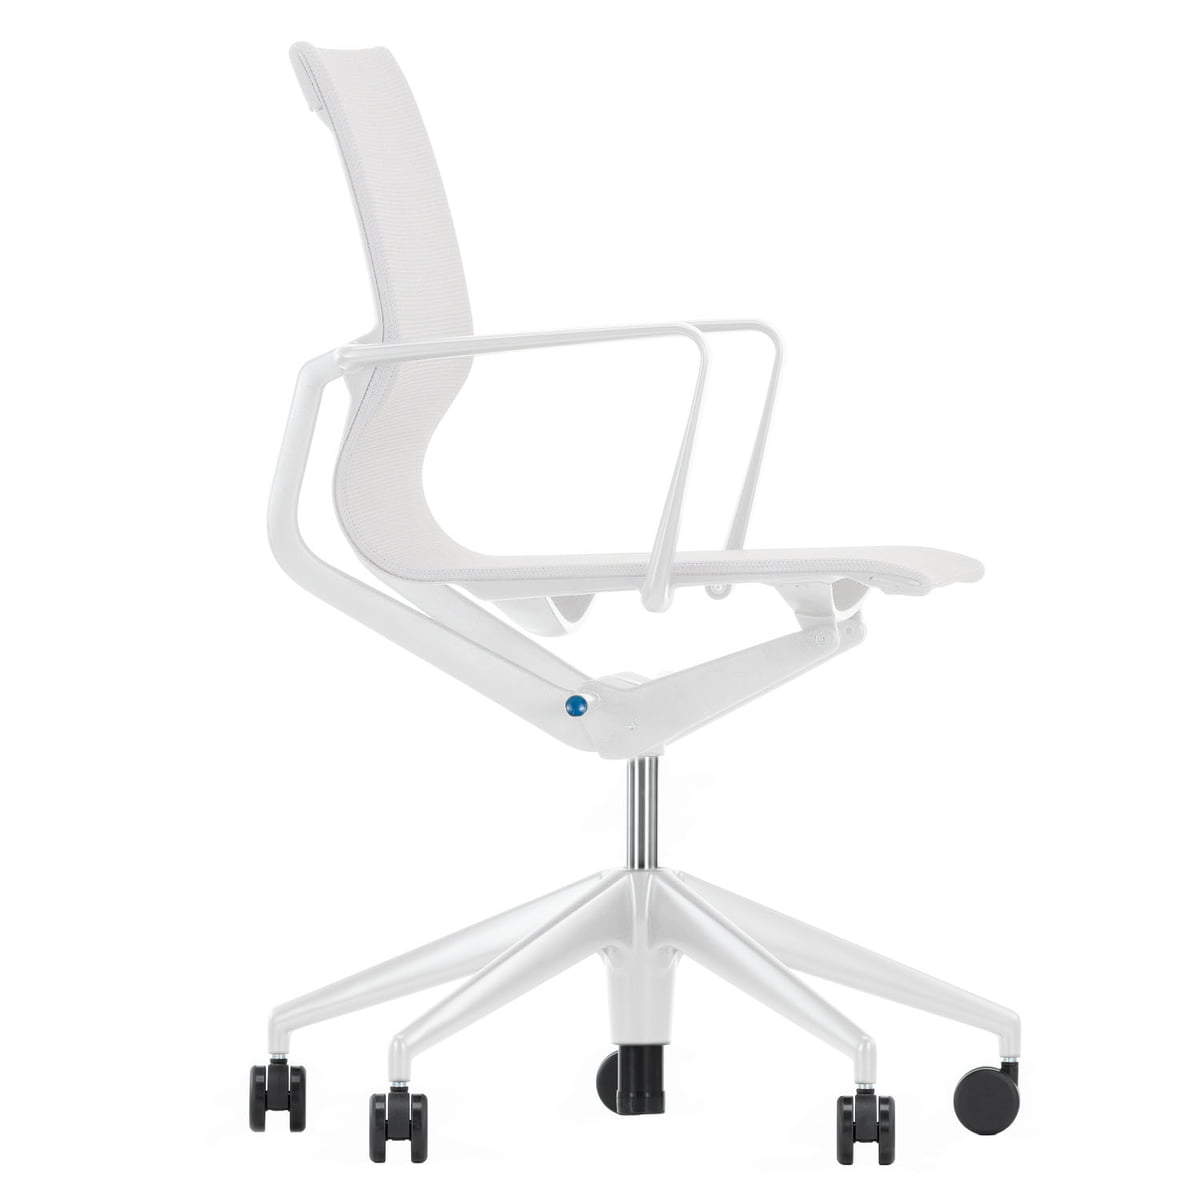 Physix Bürodrehstuhl, silber / soft grey, harte Rollen für Teppichböden